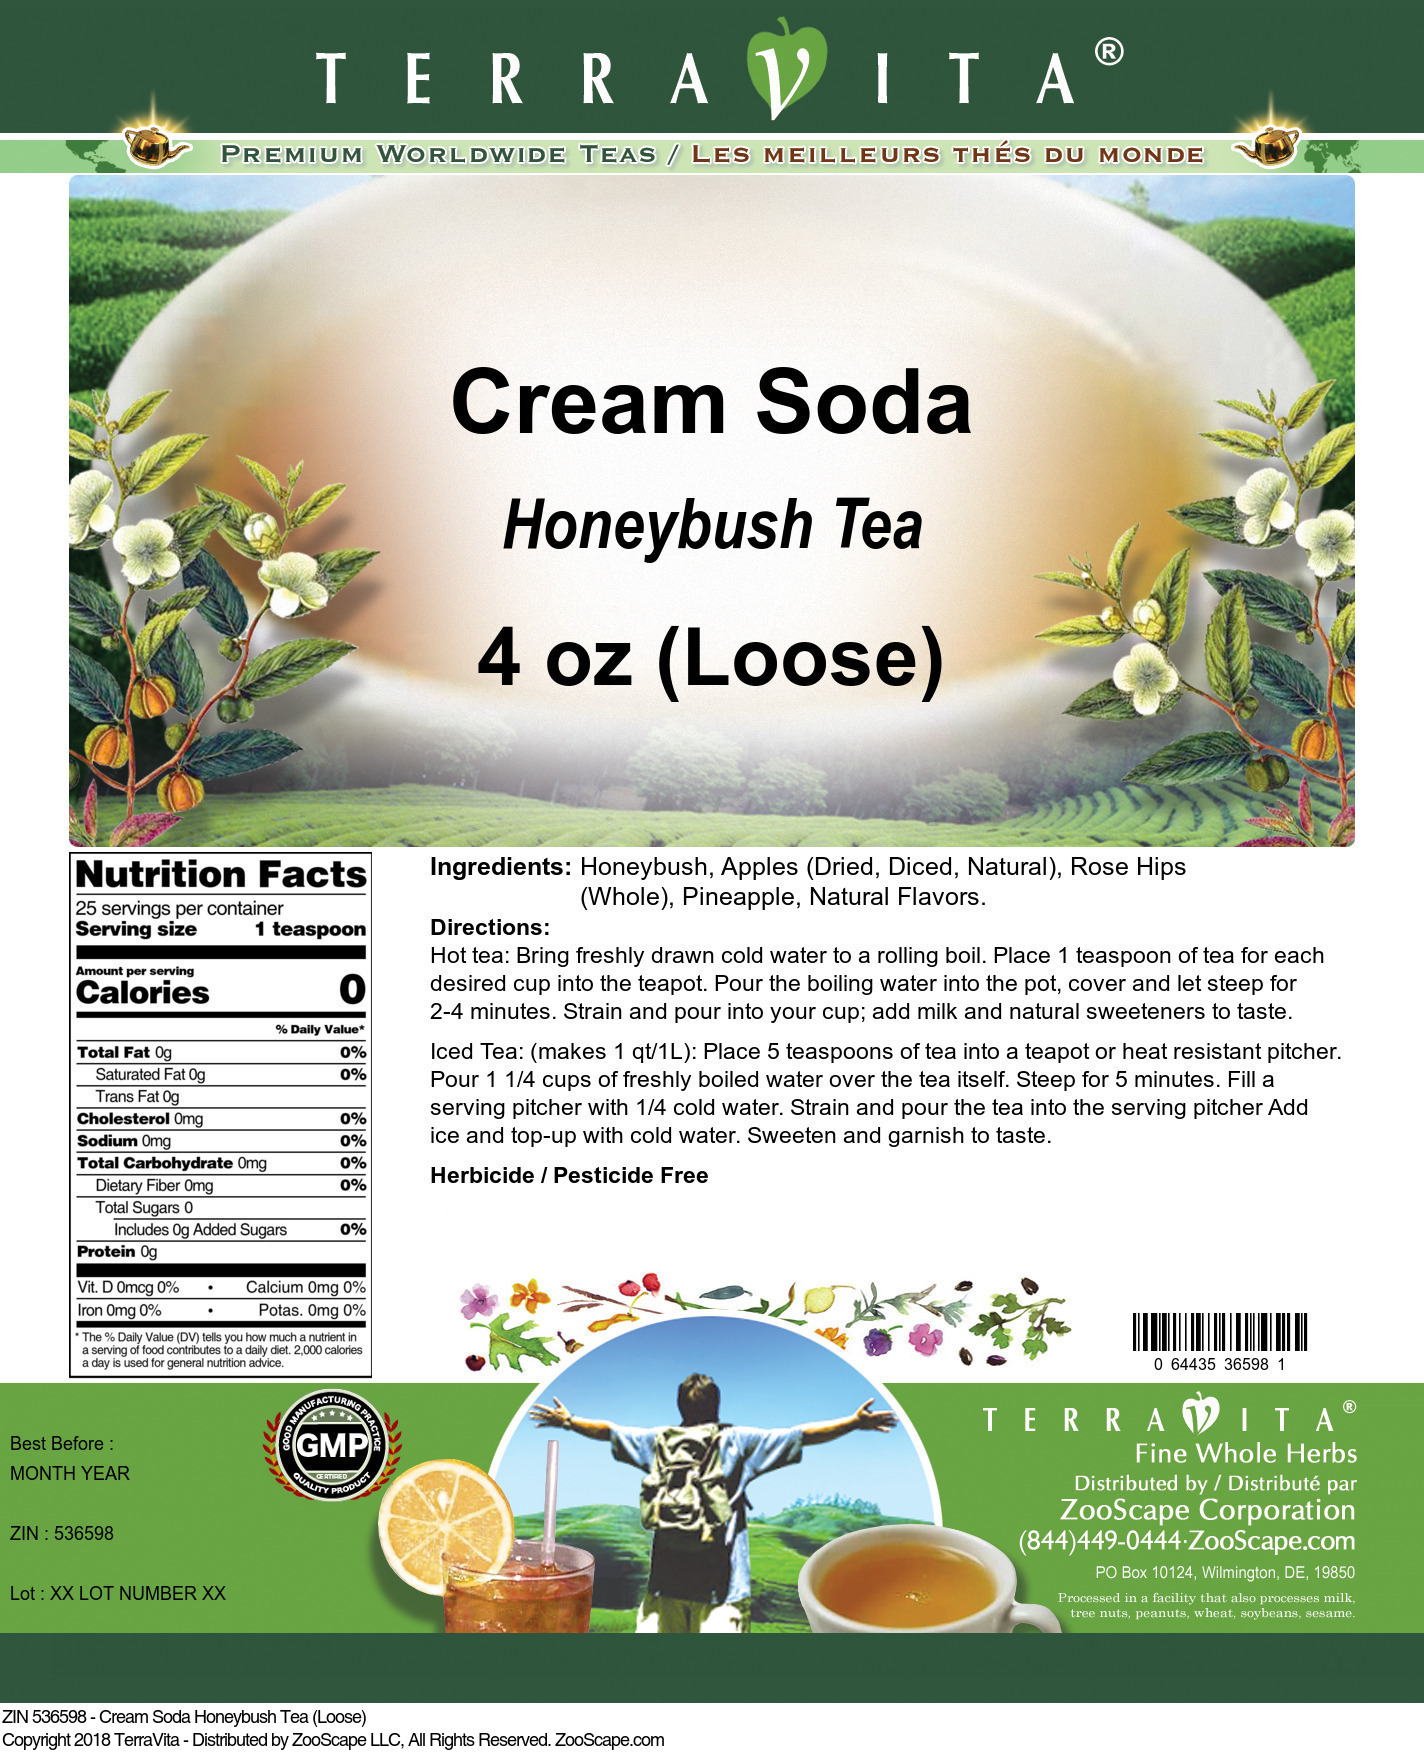 Cream Soda Honeybush Tea (Loose)